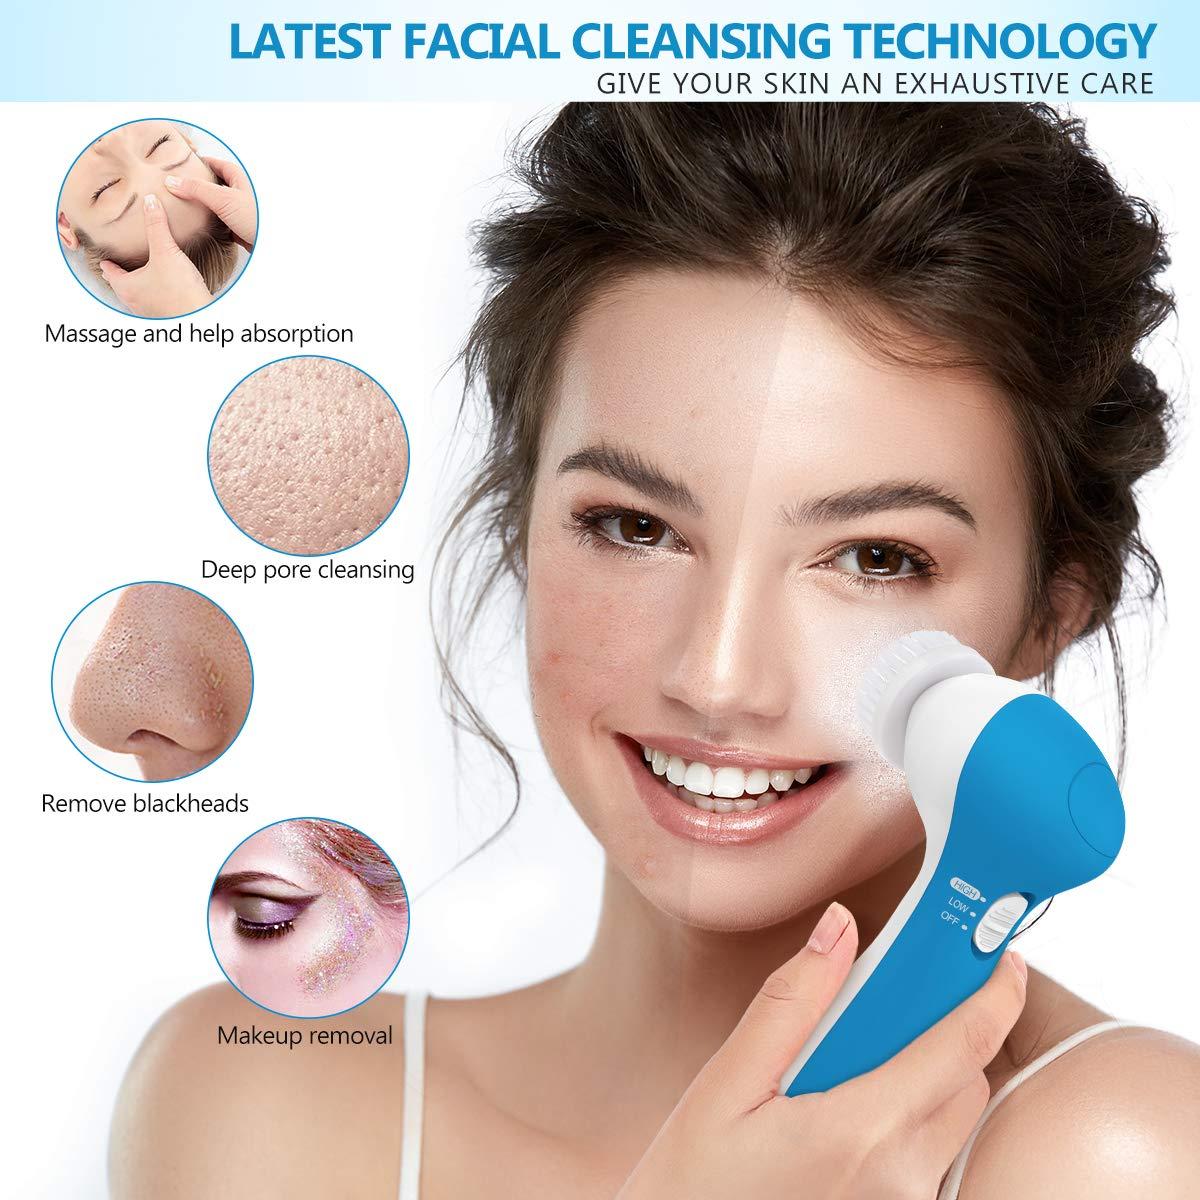 7-In-1 Facial Cleansing Brush Set, Waterproof Face Spin Brush Exfoliating Brush - Sapphire Blue